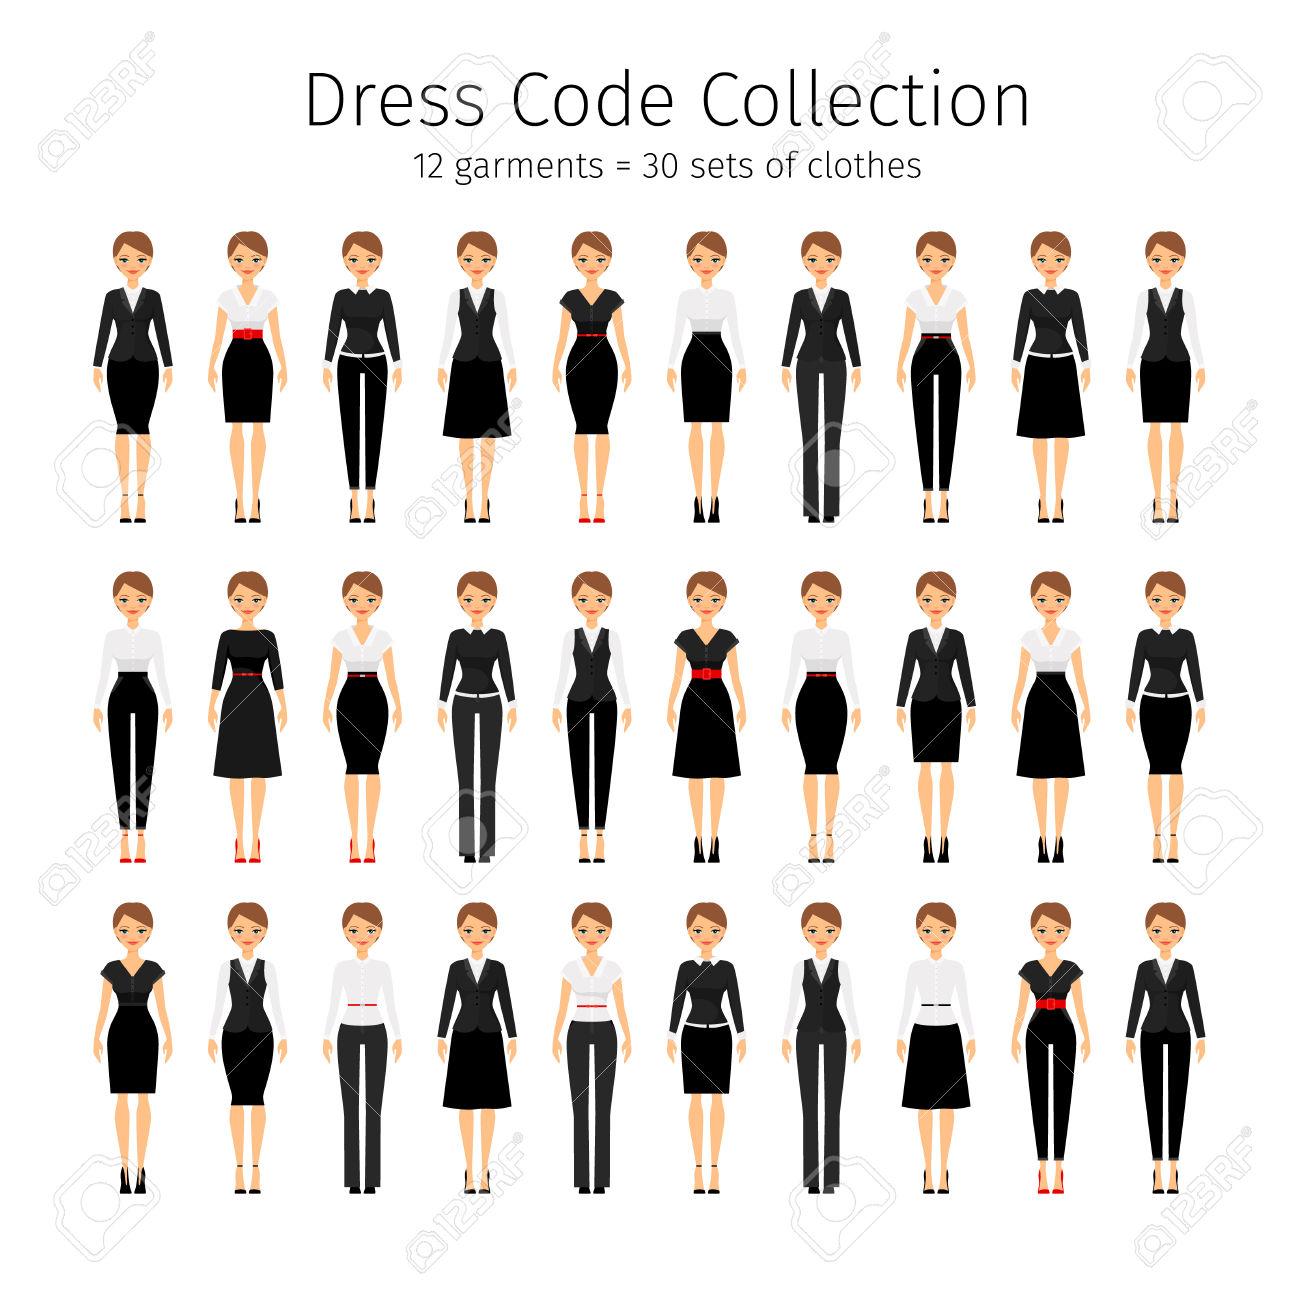 Business Woman Collection. Women Dress Code Vector Set Royalty.